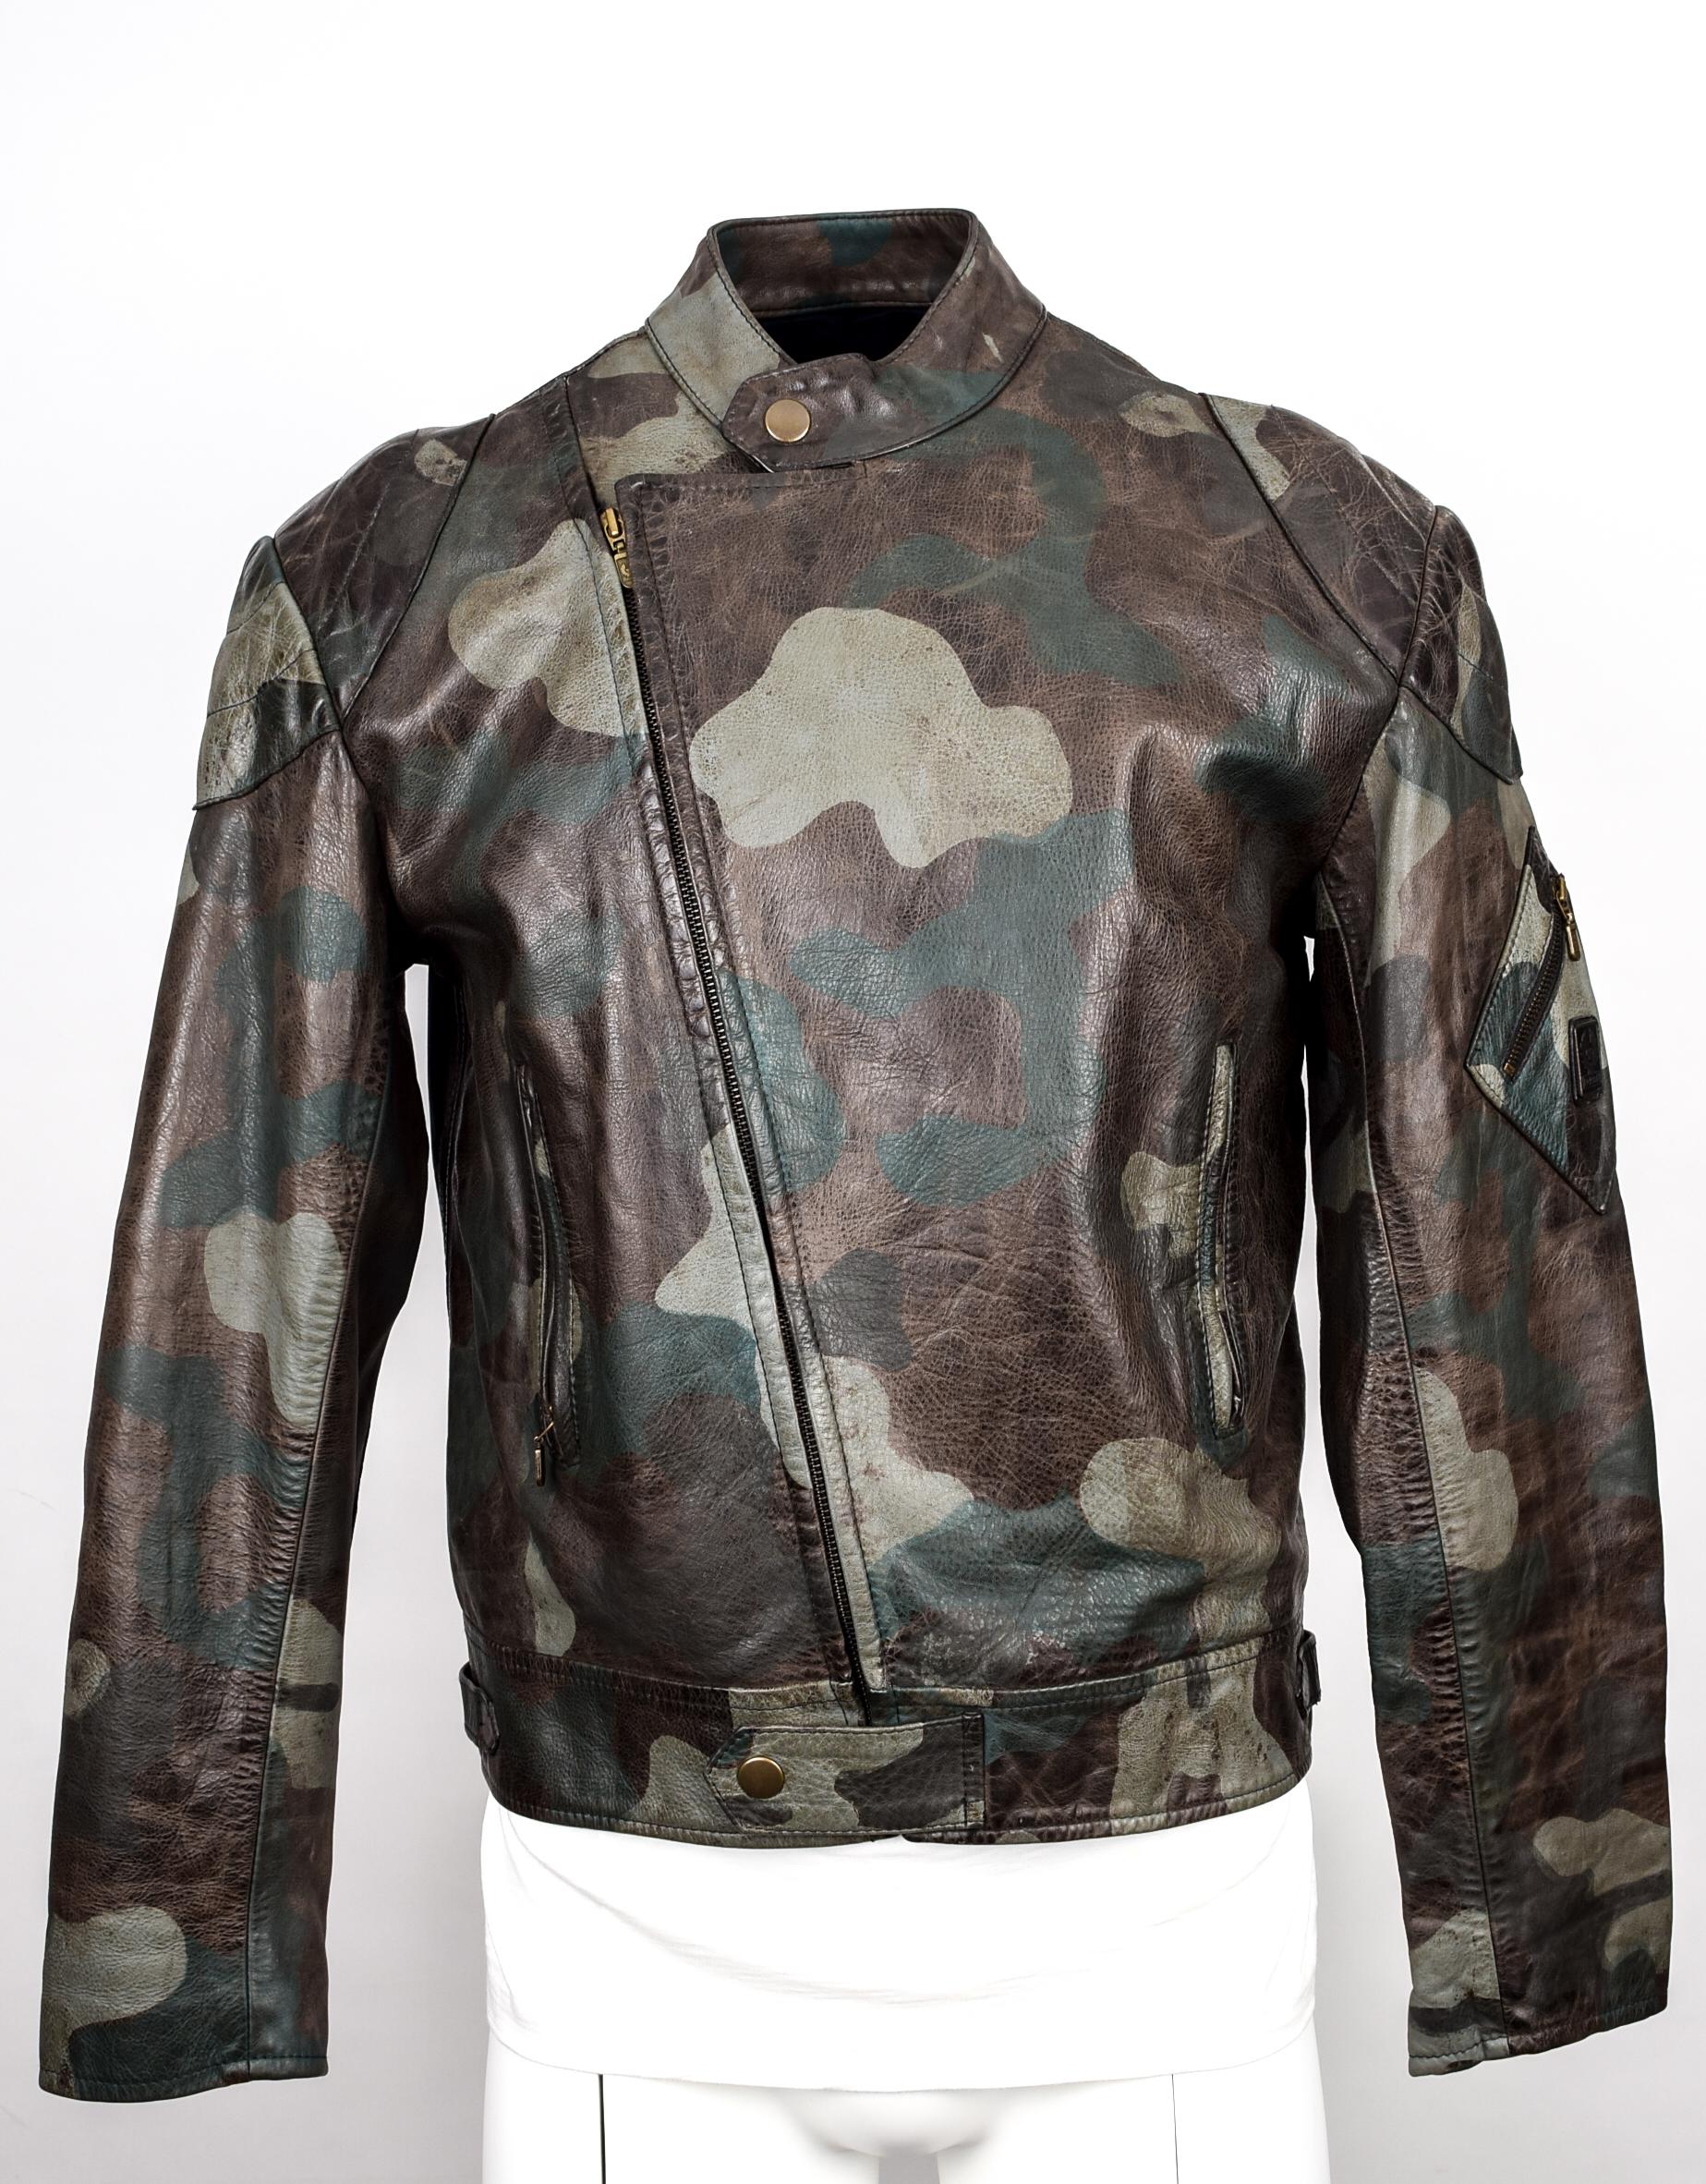 f52f6da3aaafb Belstaff Ultra Rare Belstaff Leathermaster Jacket Camouflage Camo ...